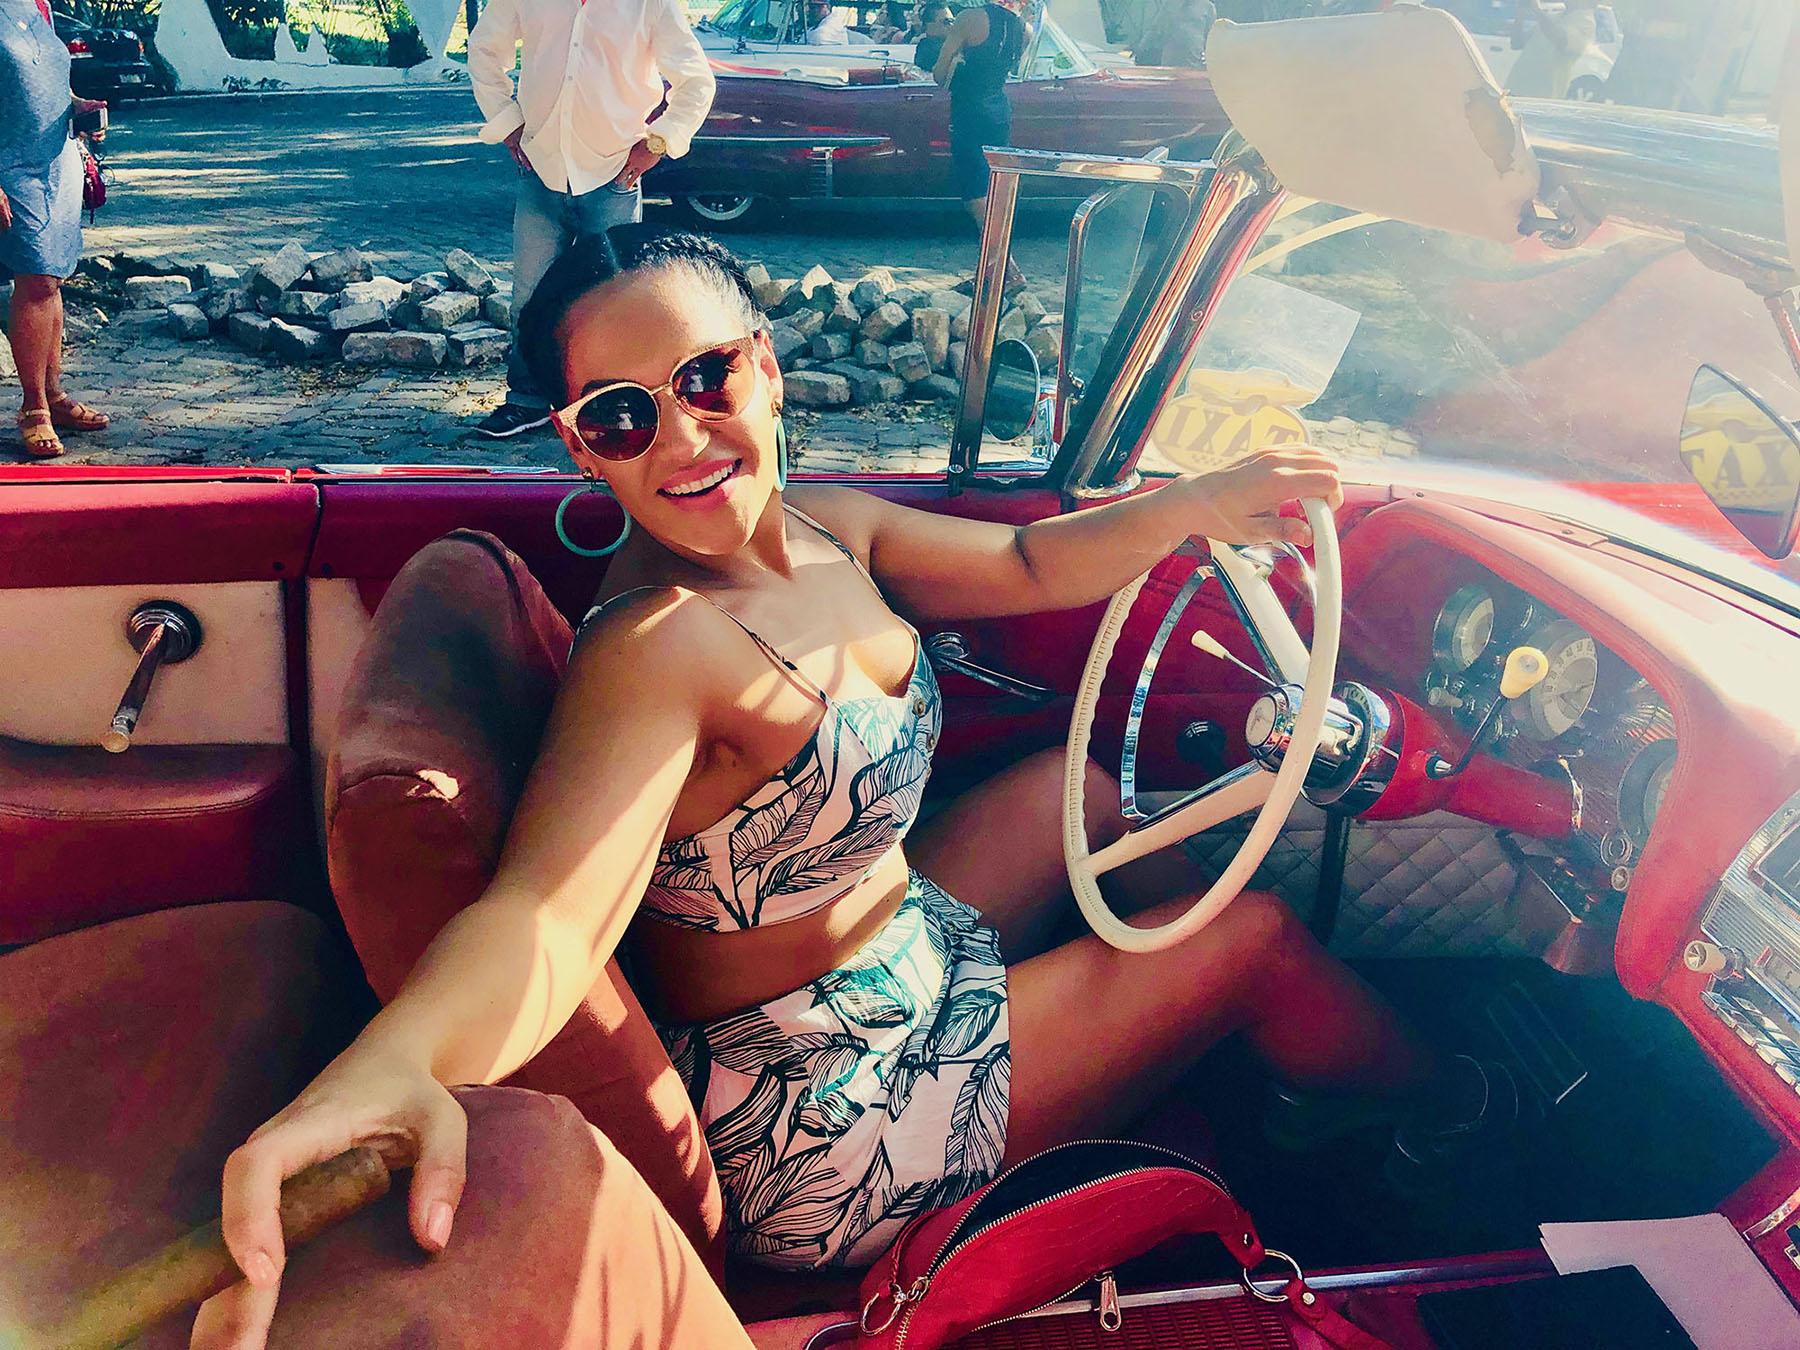 Notes From A Solo Female Traveler: Natalie Lizarraga